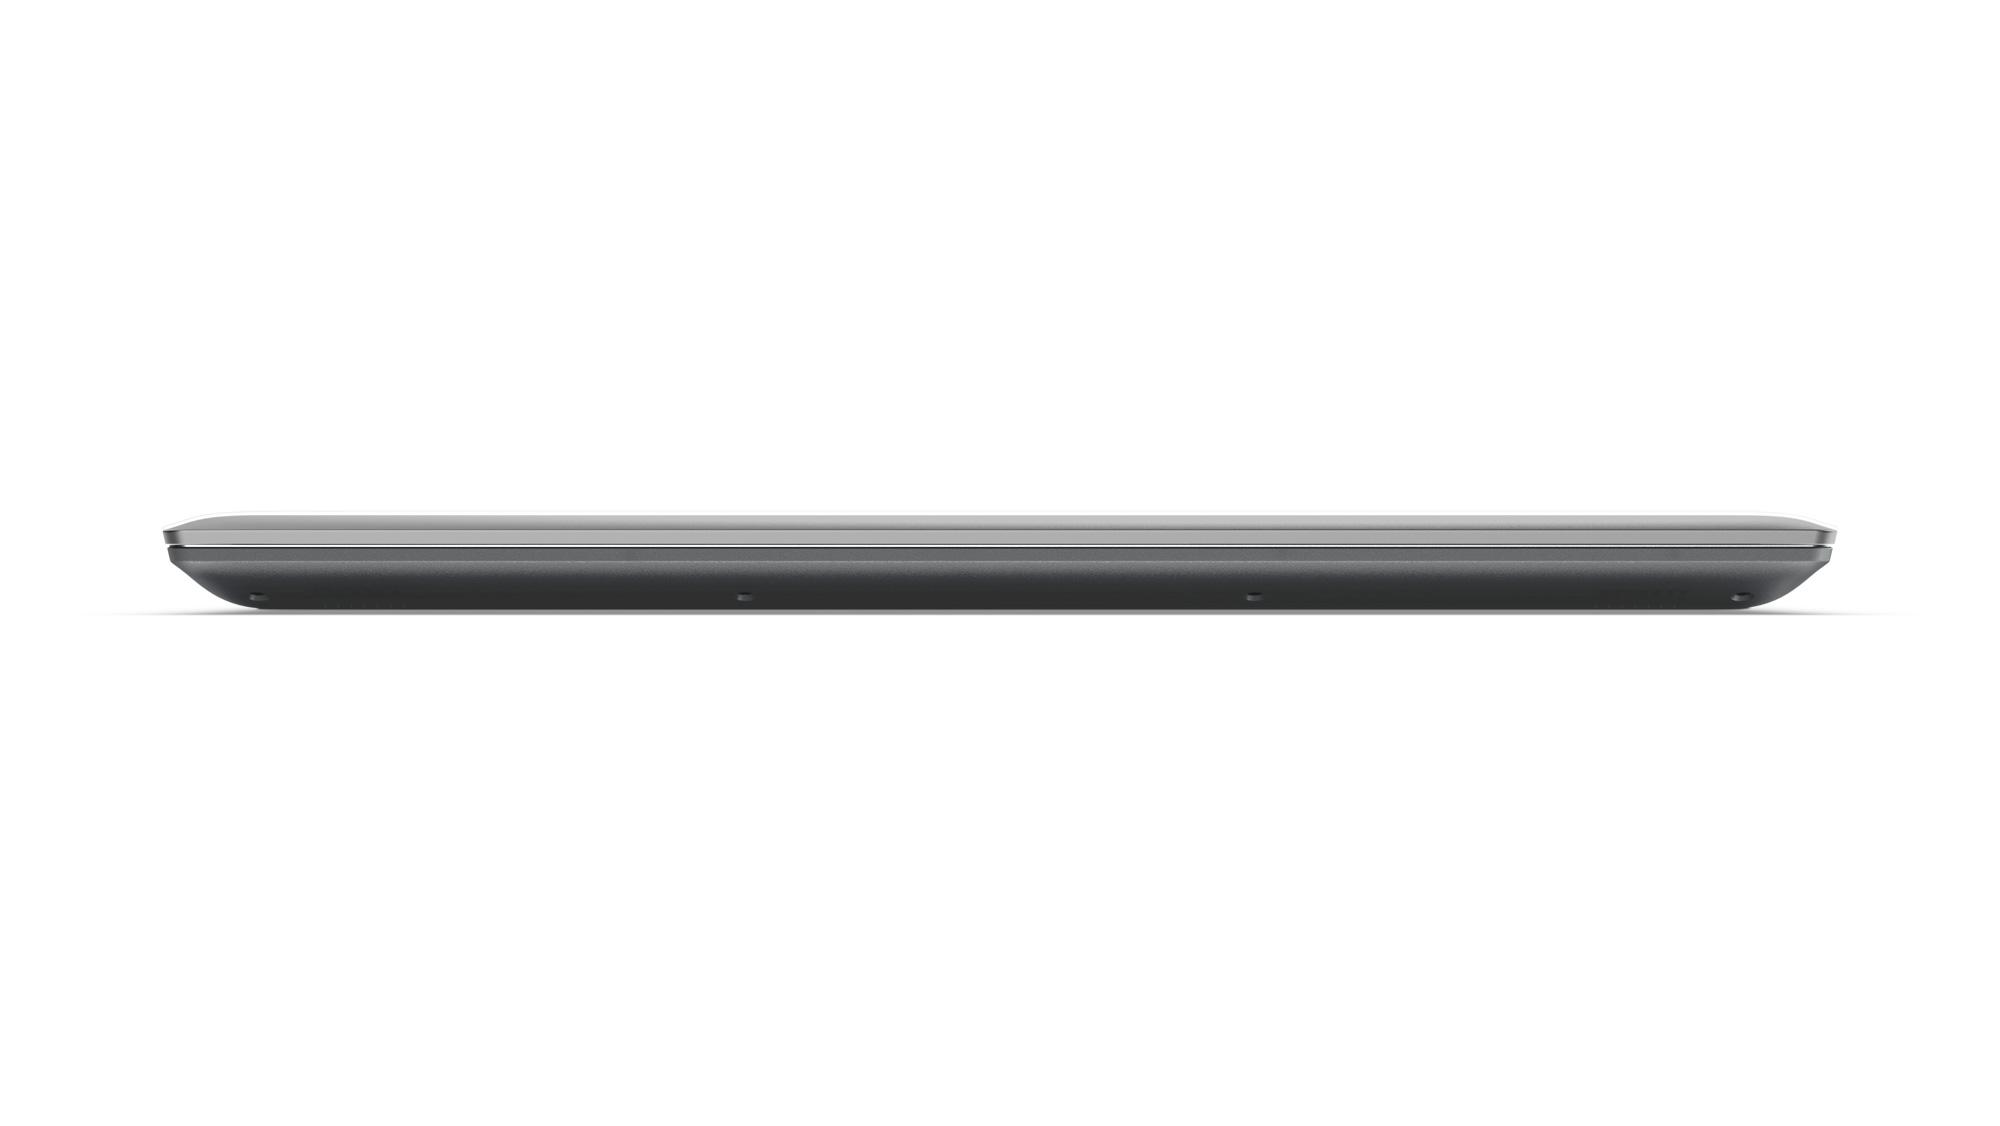 Фото  Ноутбук Lenovo ideapad 320-15IKB Platinum Grey (80XL03WCRA)